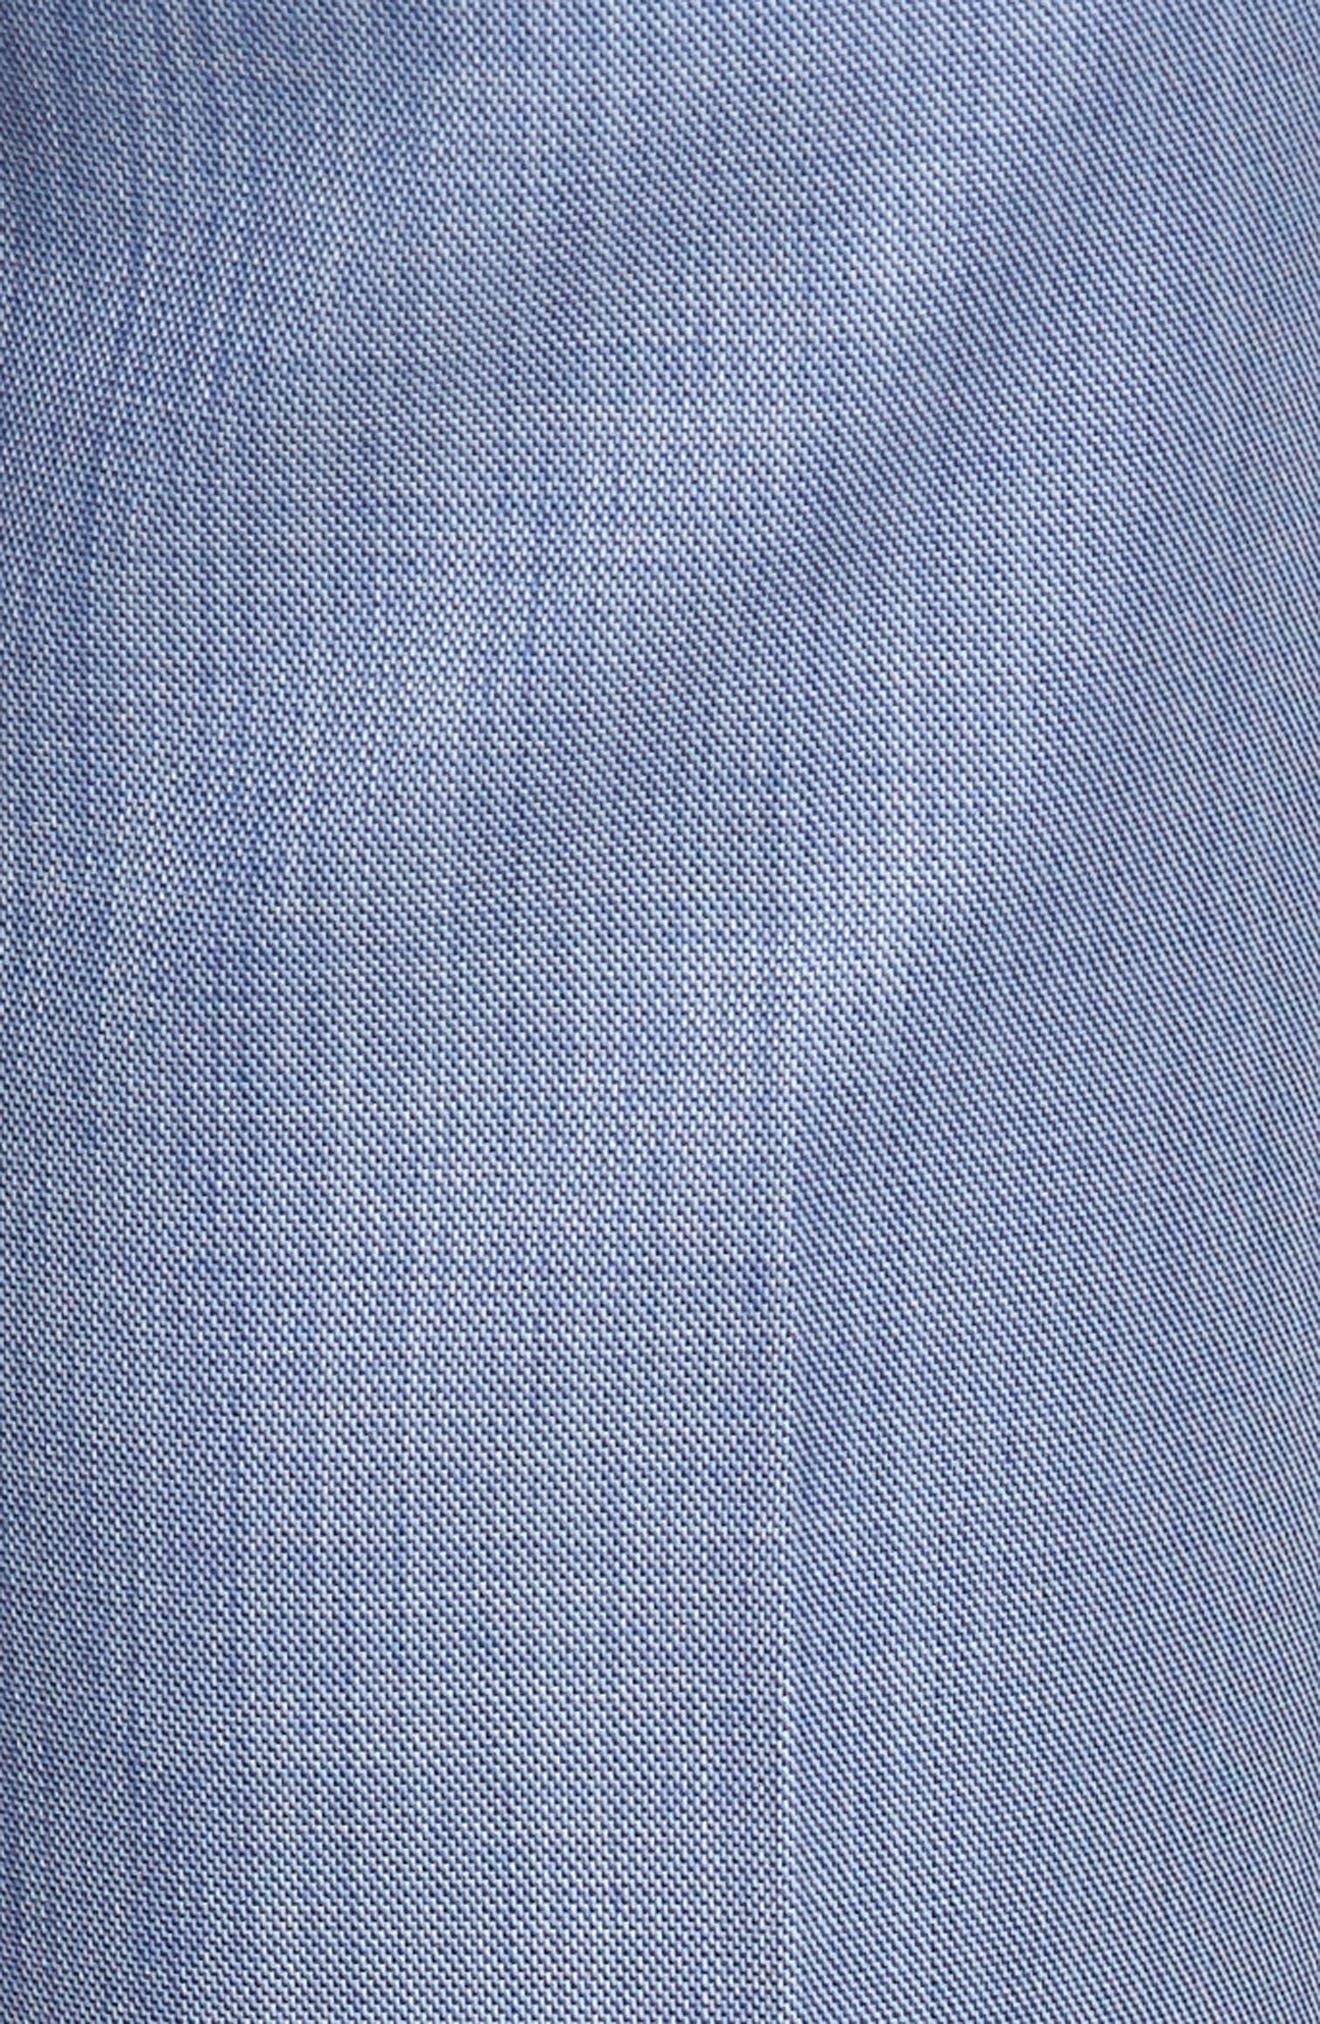 Flat Front Sharkskin Wool Trousers,                             Alternate thumbnail 5, color,                             LIGHT BLUE